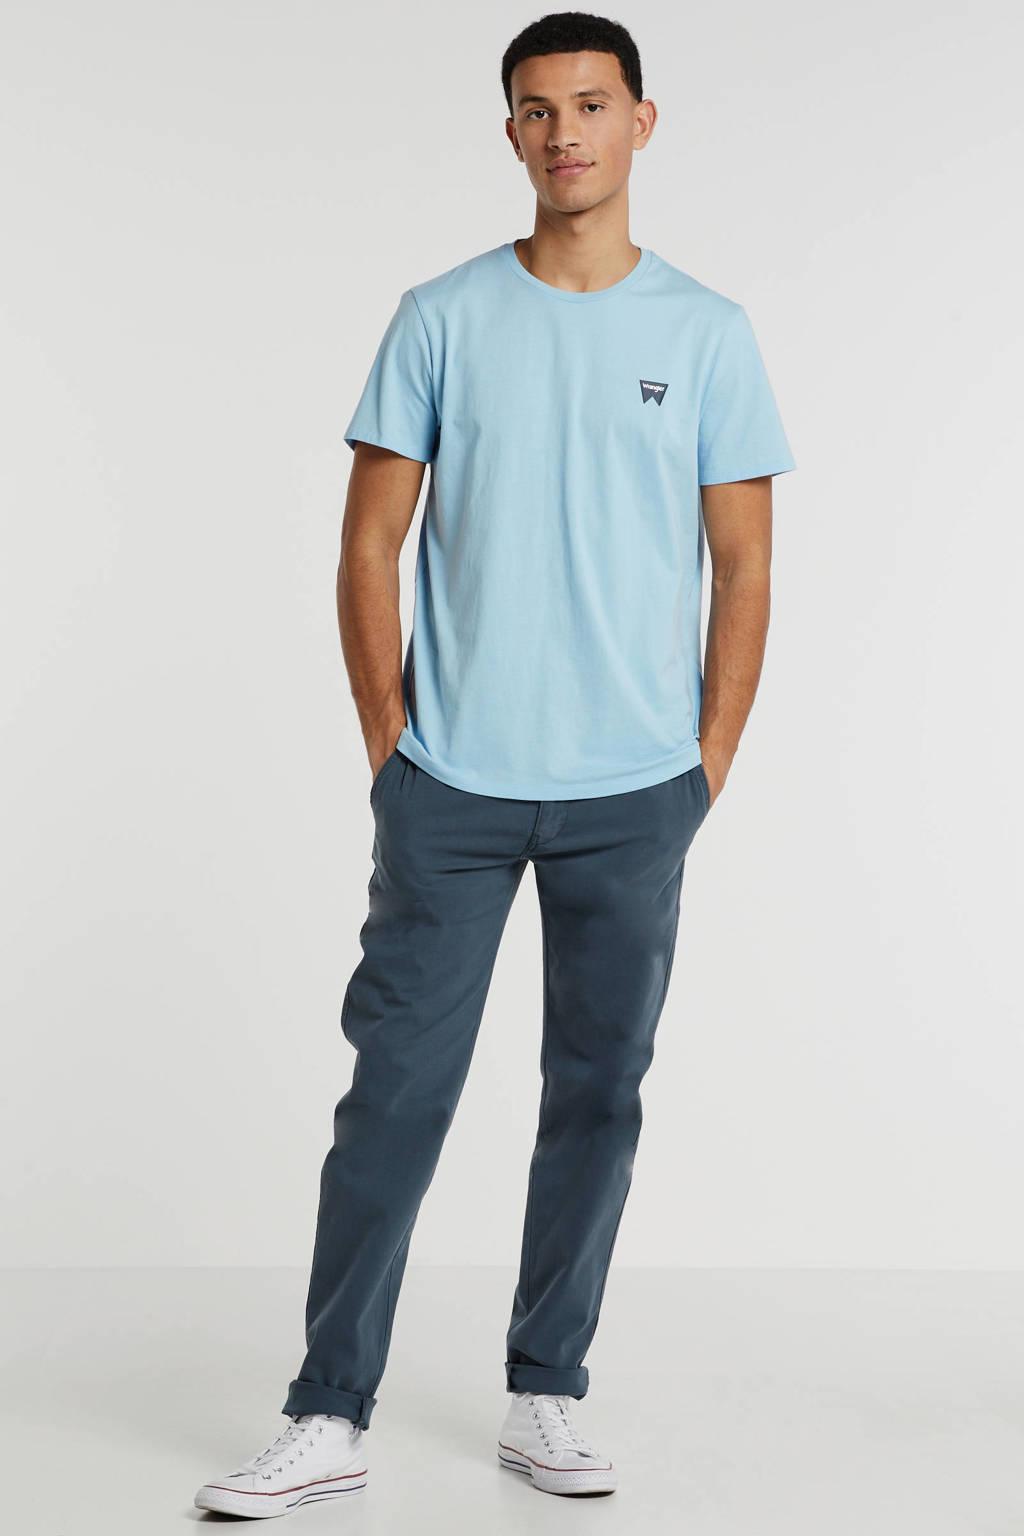 Wrangler T-shirt met logo cerulean blue, Cerulean Blue